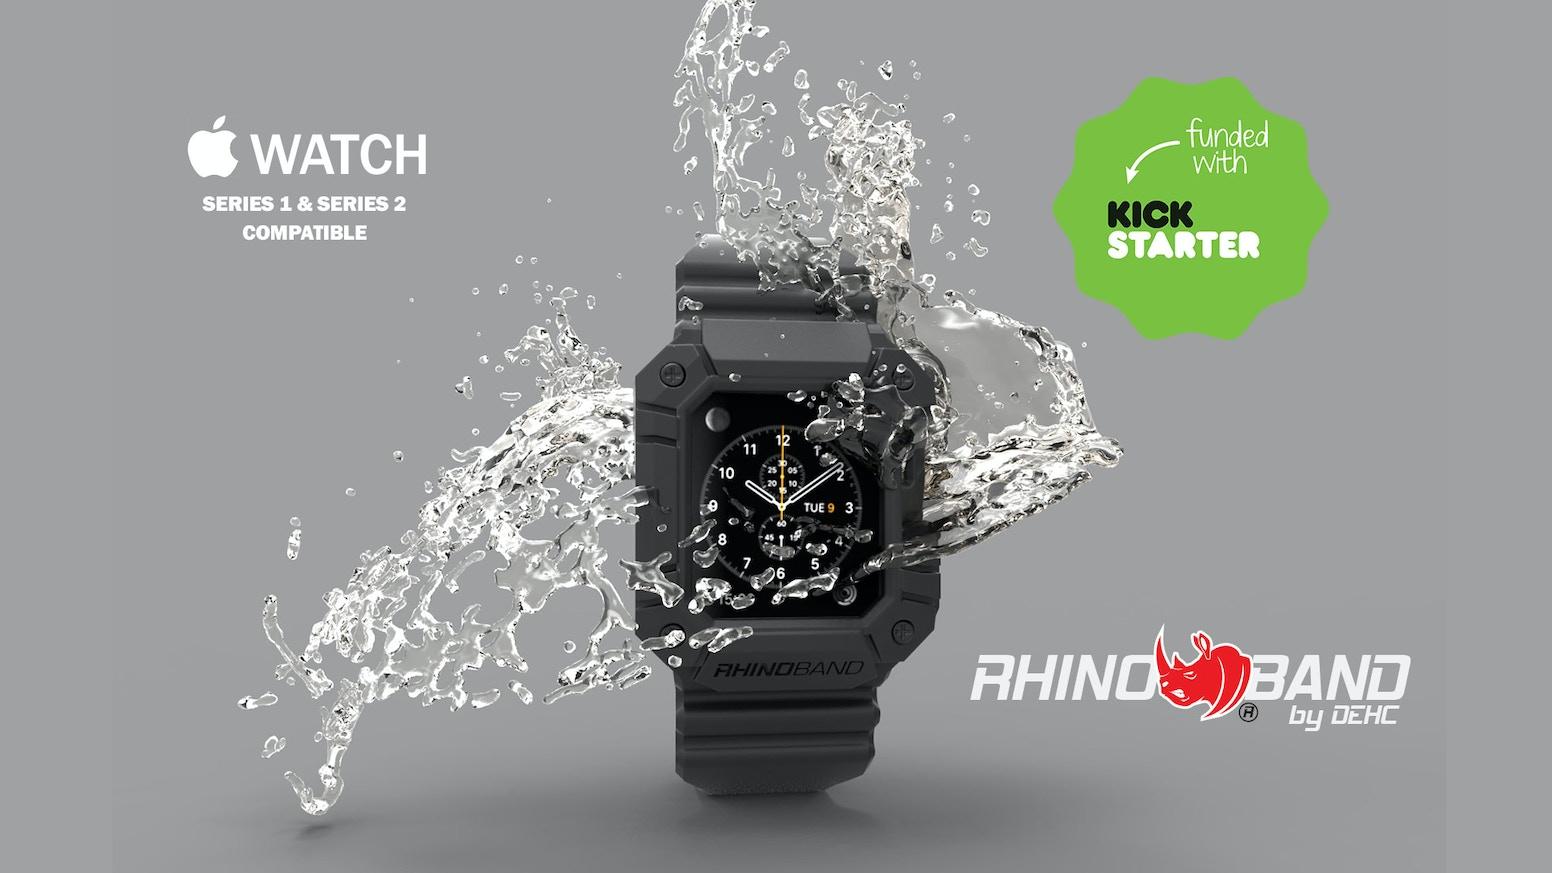 new concept 1b041 ebec3 Rhino Band for Apple Watch by DEHC — Kickstarter